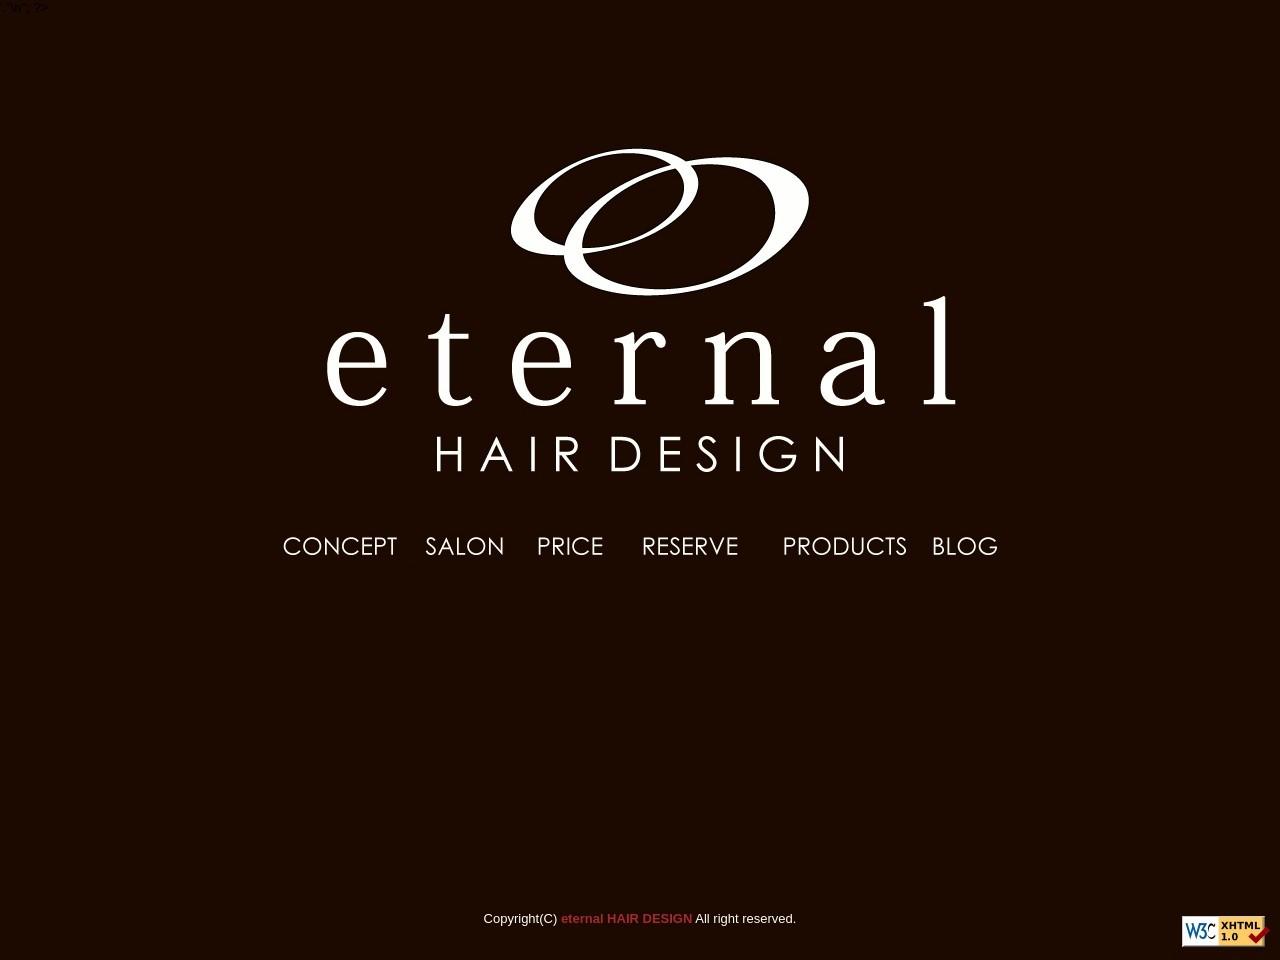 eternal HAIR DESIGN 【エターナル ヘア デザイン】